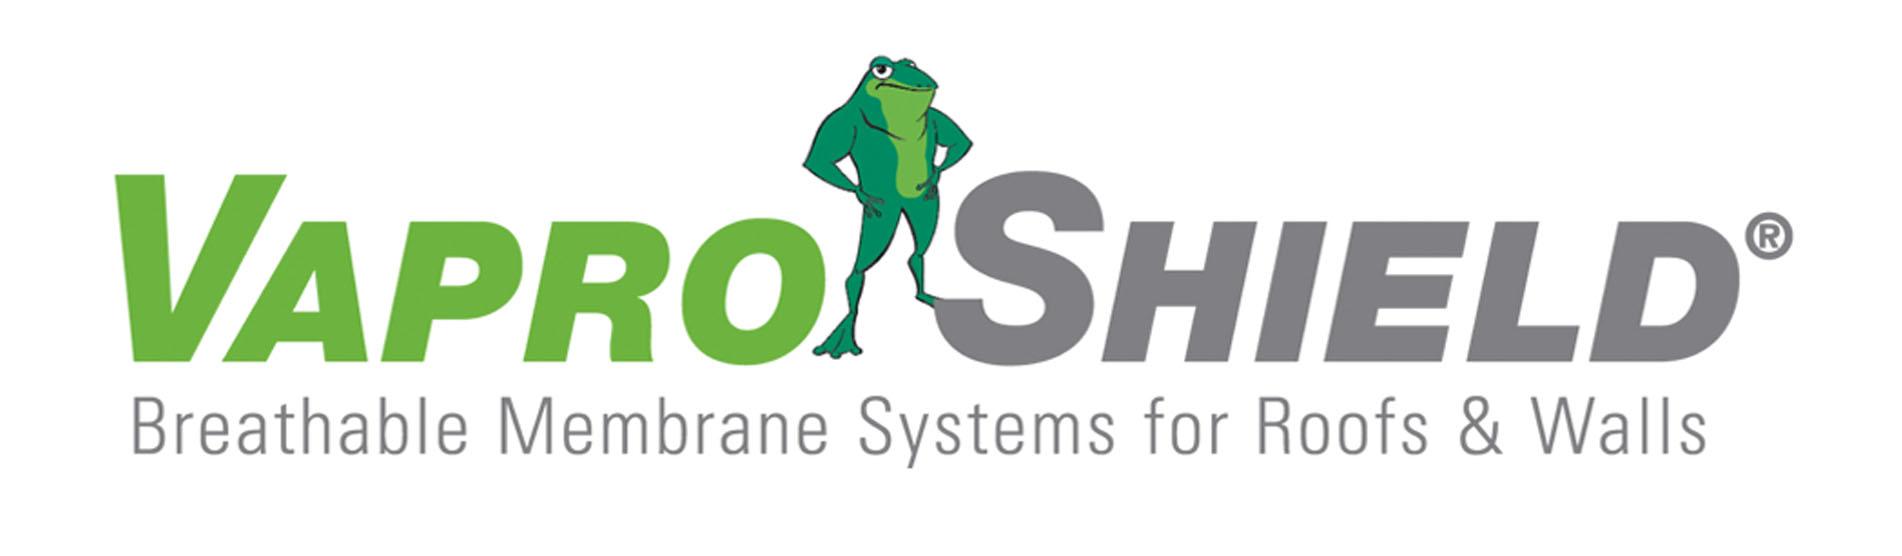 vaproshield_logo